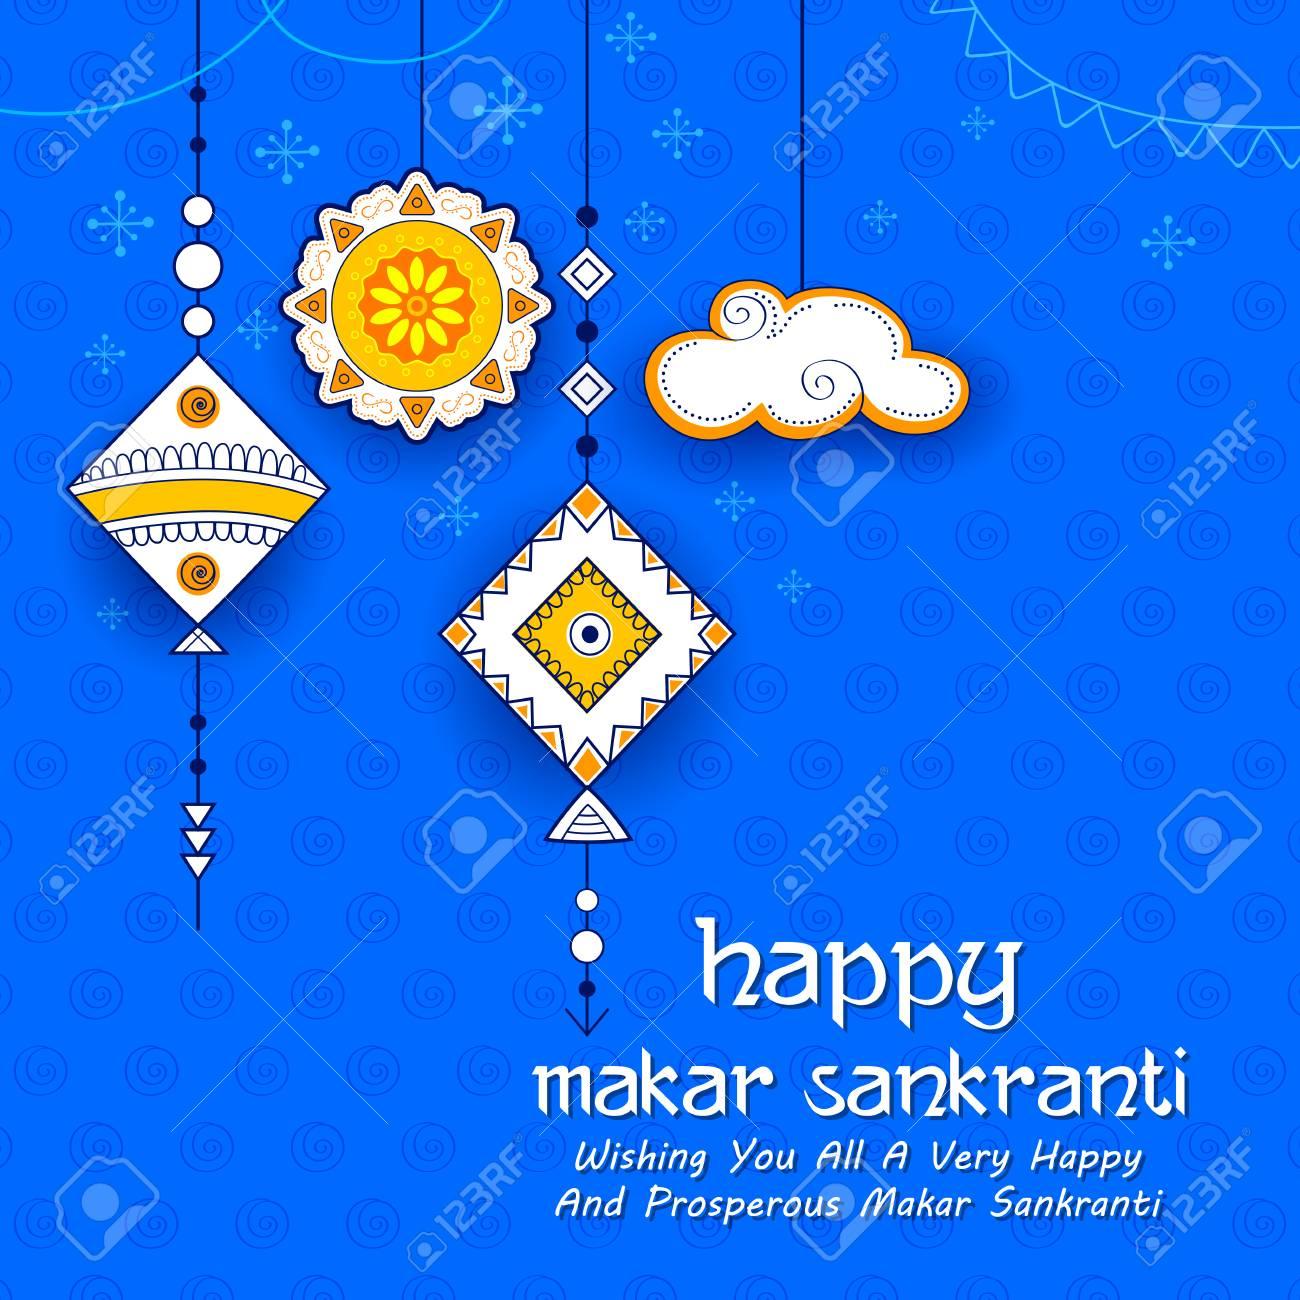 Happy Makar Sankranti wallpaper with colorful kite string for festival of India - 91805232